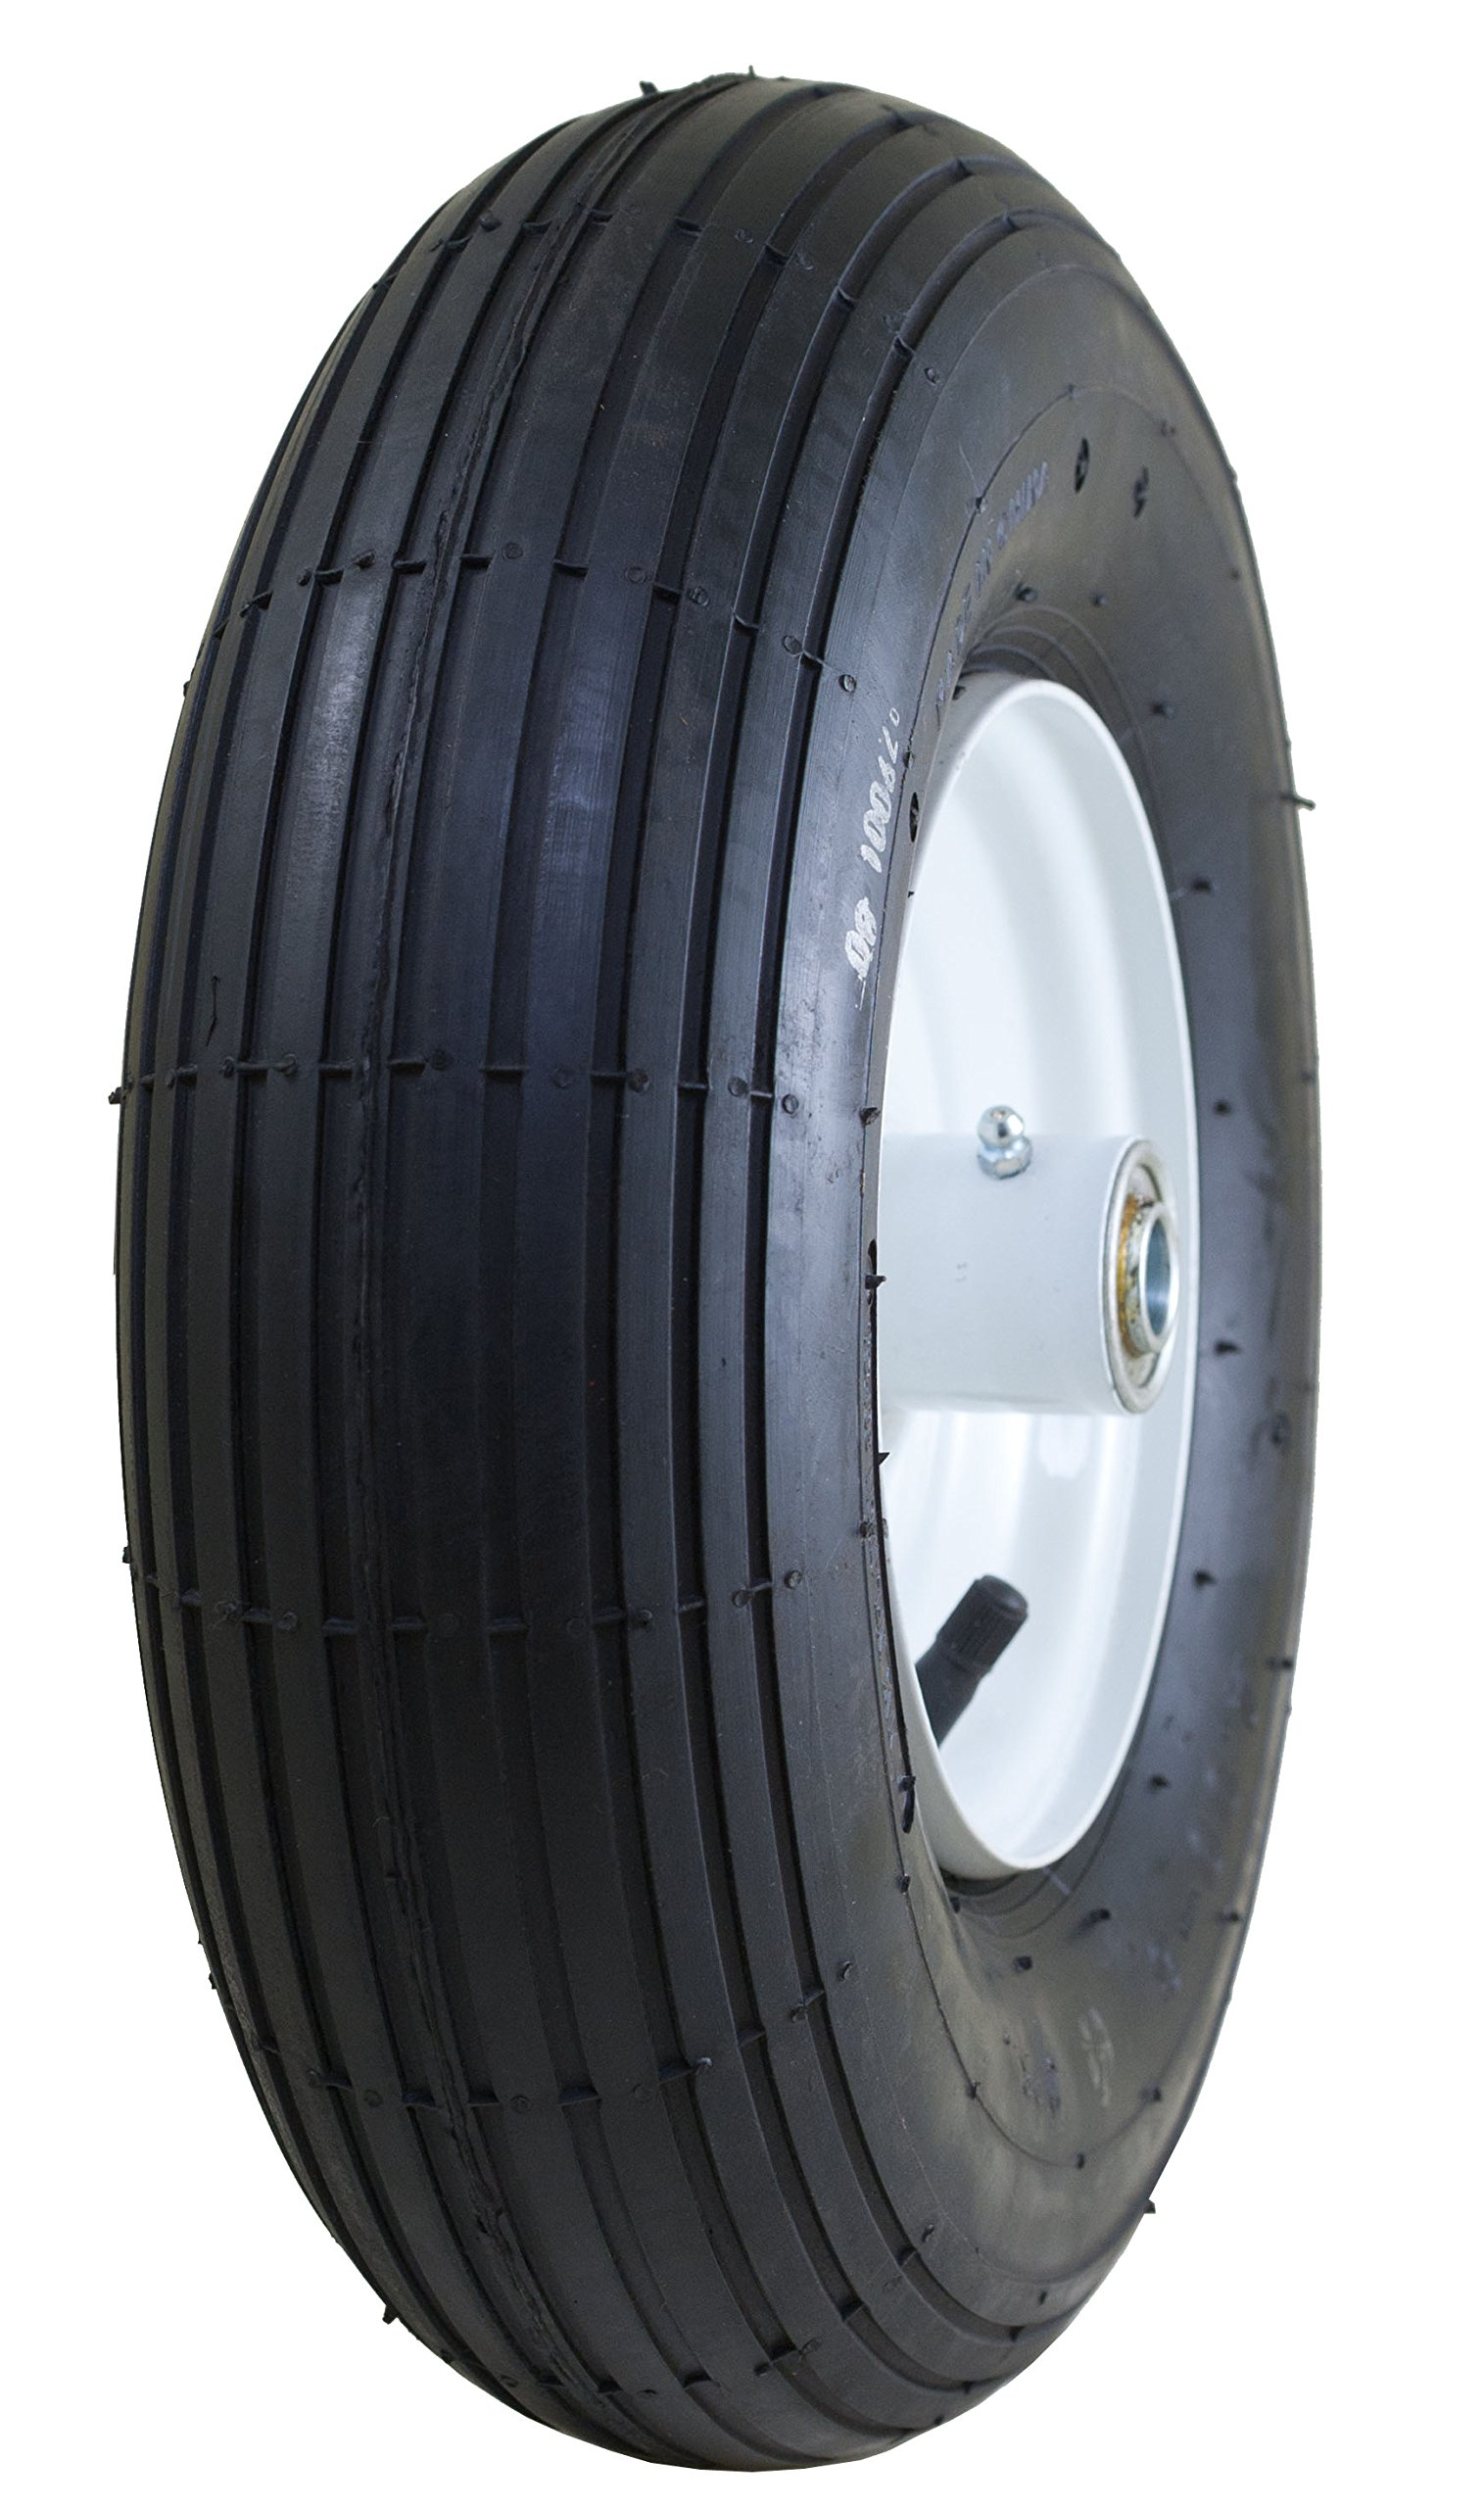 Marathon 4.00-6'' Pneumatic (Air Filled) Tire on Wheel, 3'' Hub, 5/8'' Bearings